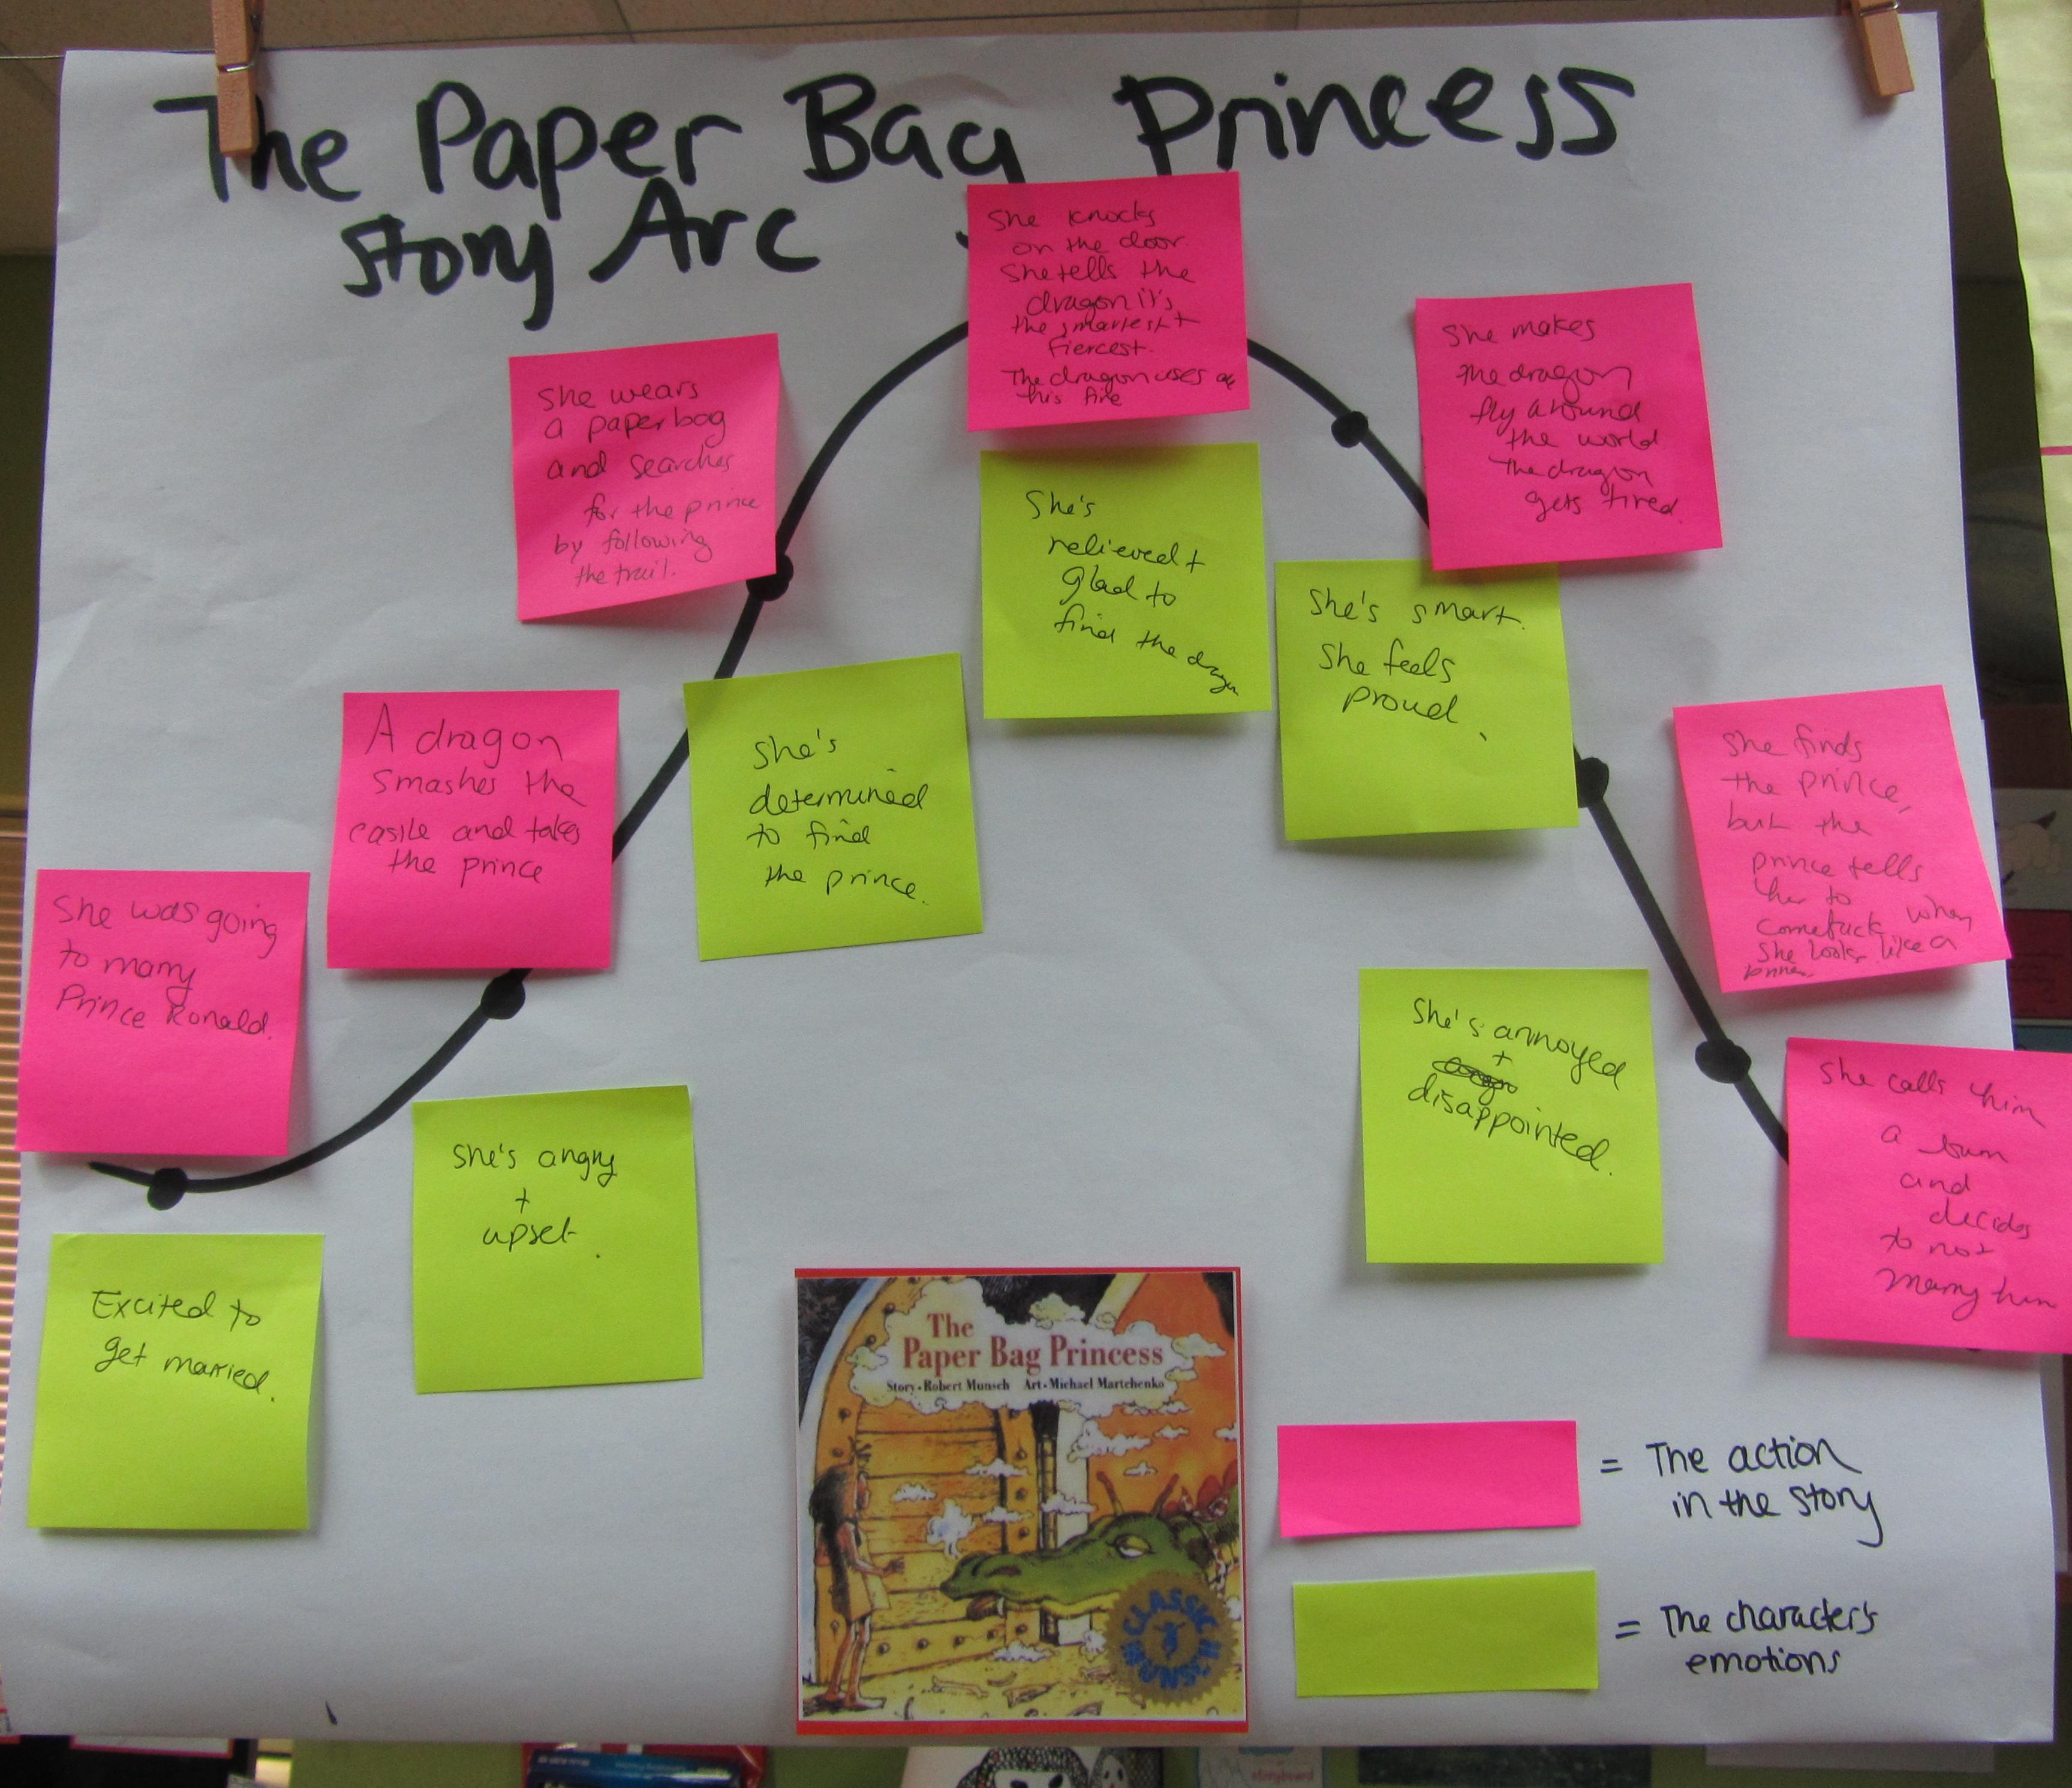 The Princess Process Essay